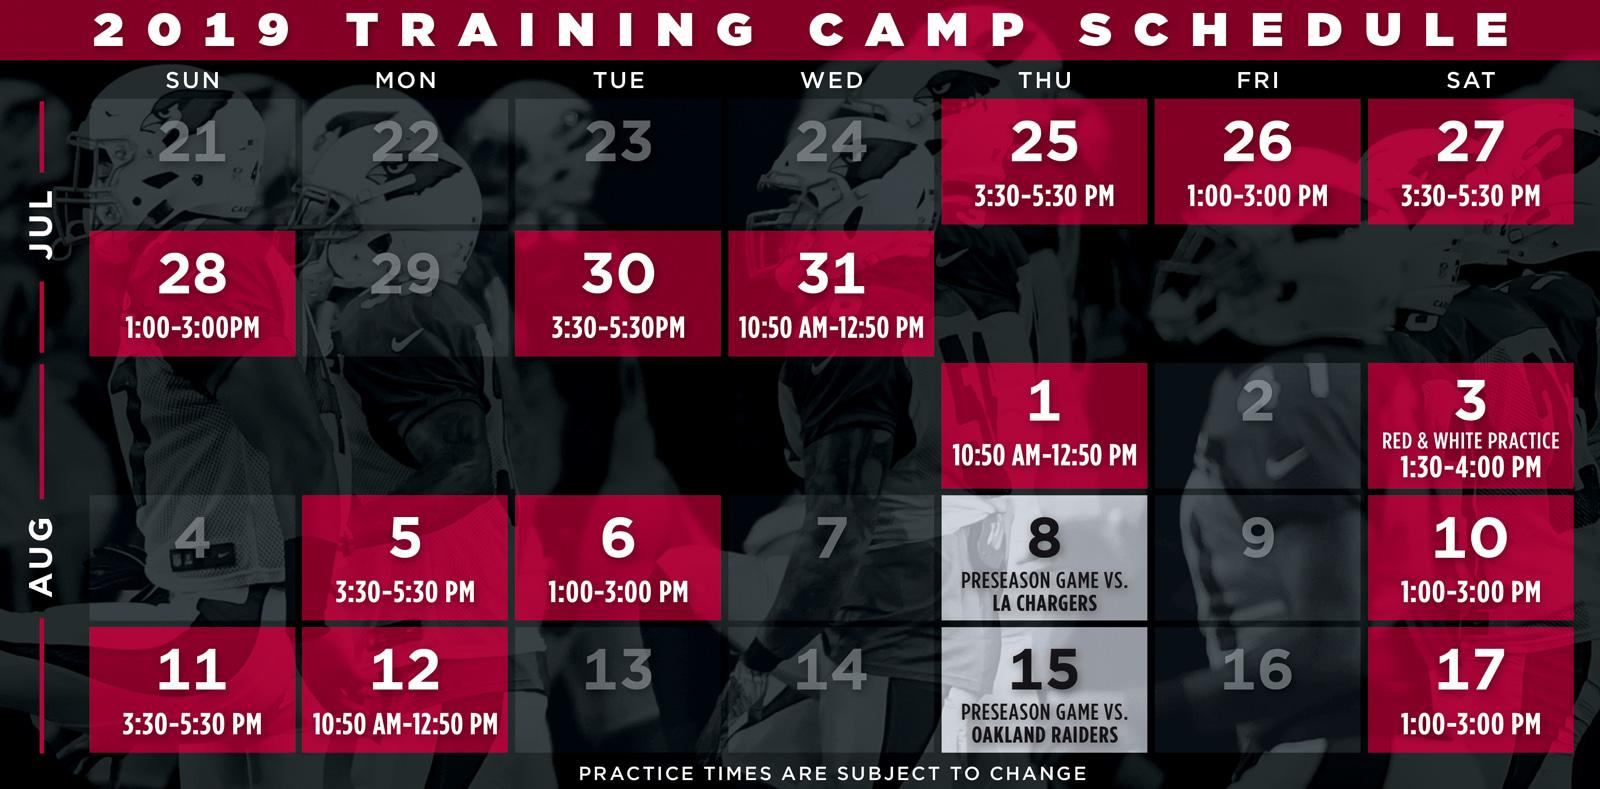 picture relating to St Louis Cardinals Printable Schedule named Cardinals Exercising Camp Arizona Cardinals -